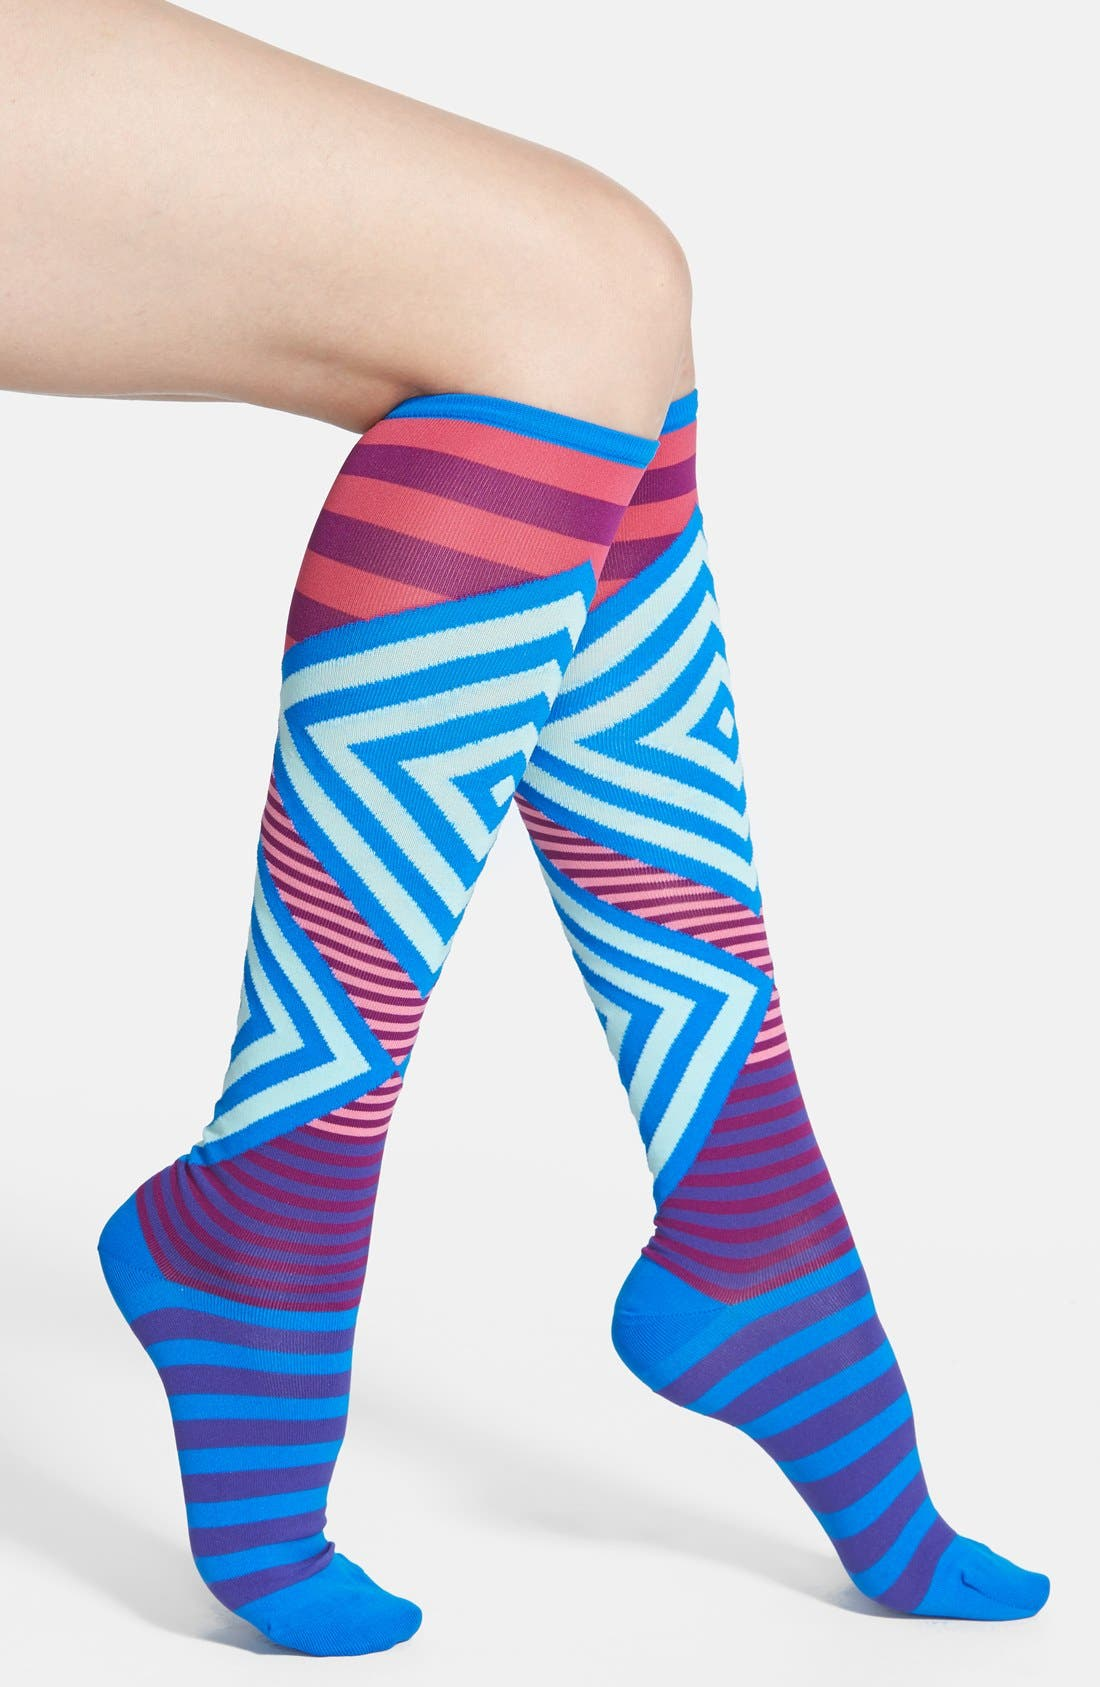 Alternate Image 1 Selected - Hot Sox Mixed Stripe Knee High Socks